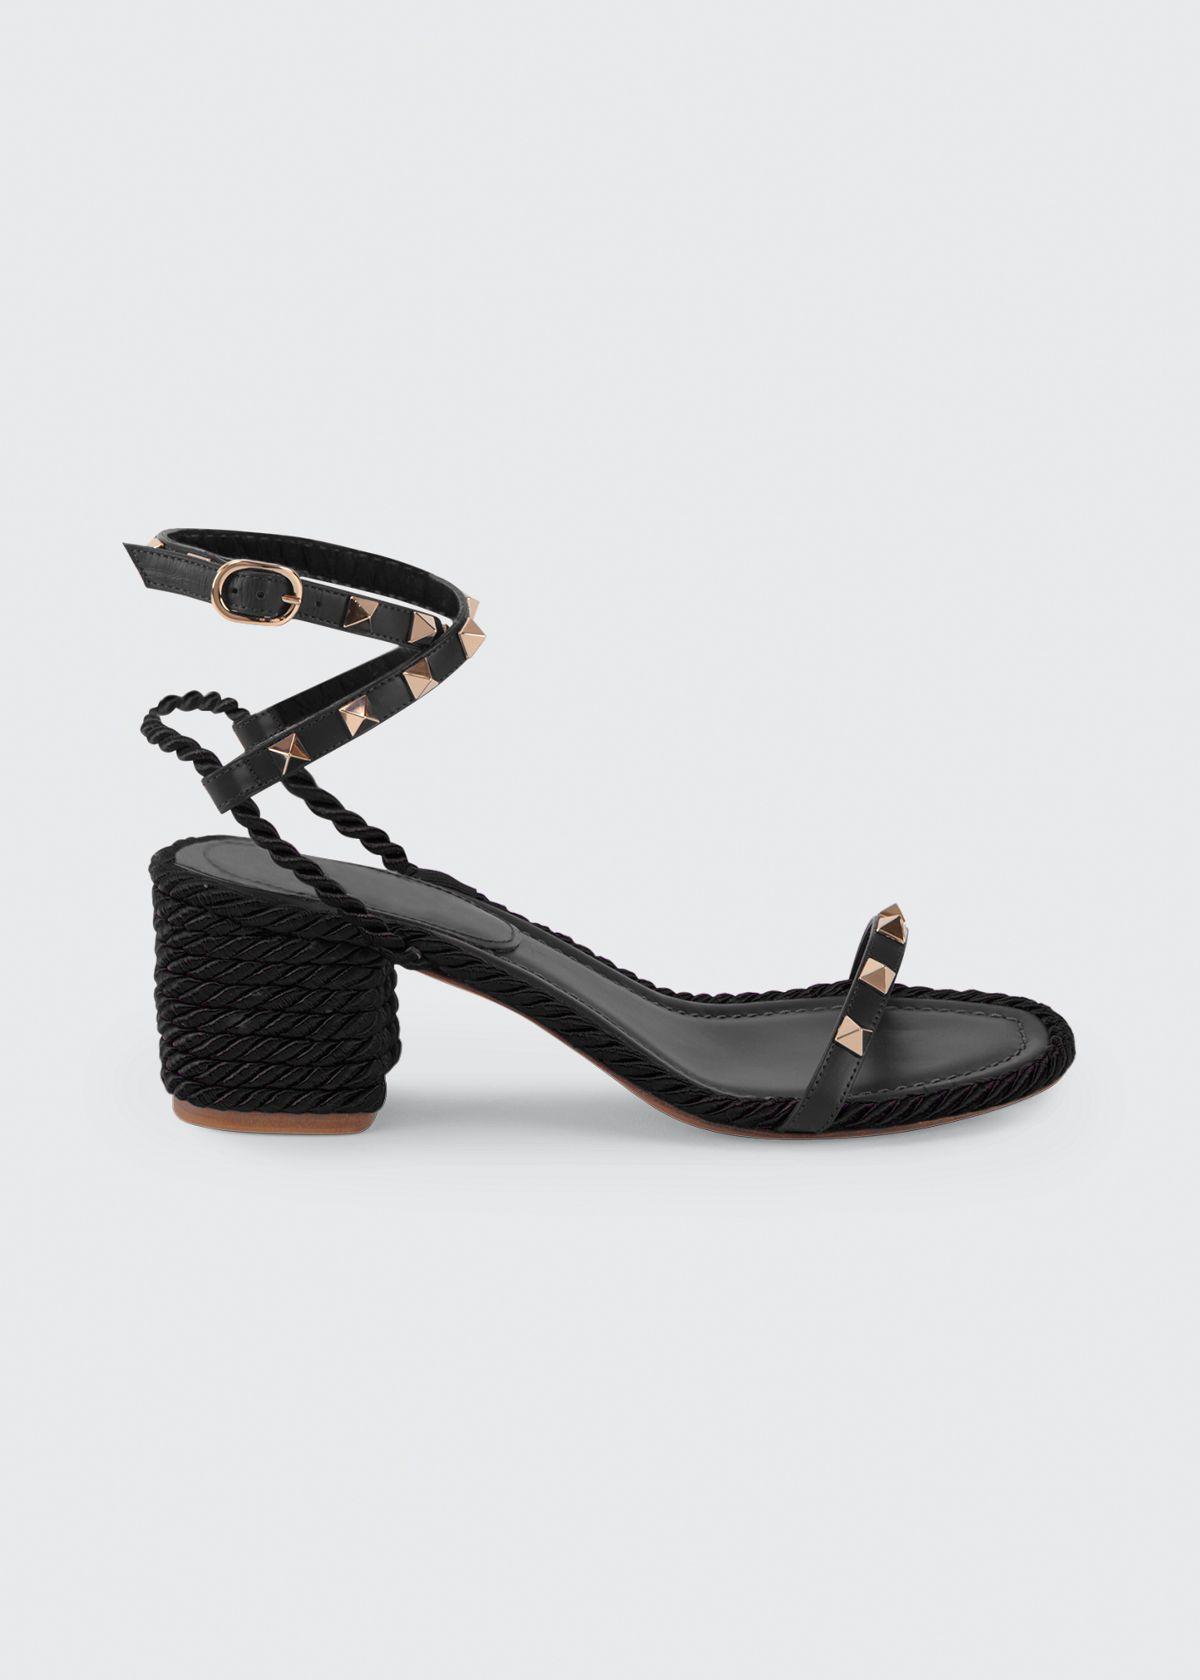 Valentino Garavani Valentino Rockstud Rope Sandal In Black Modesens In 2020 Valentino Rockstud Strappy Block Heel Sandals Ankle Strap Sandals